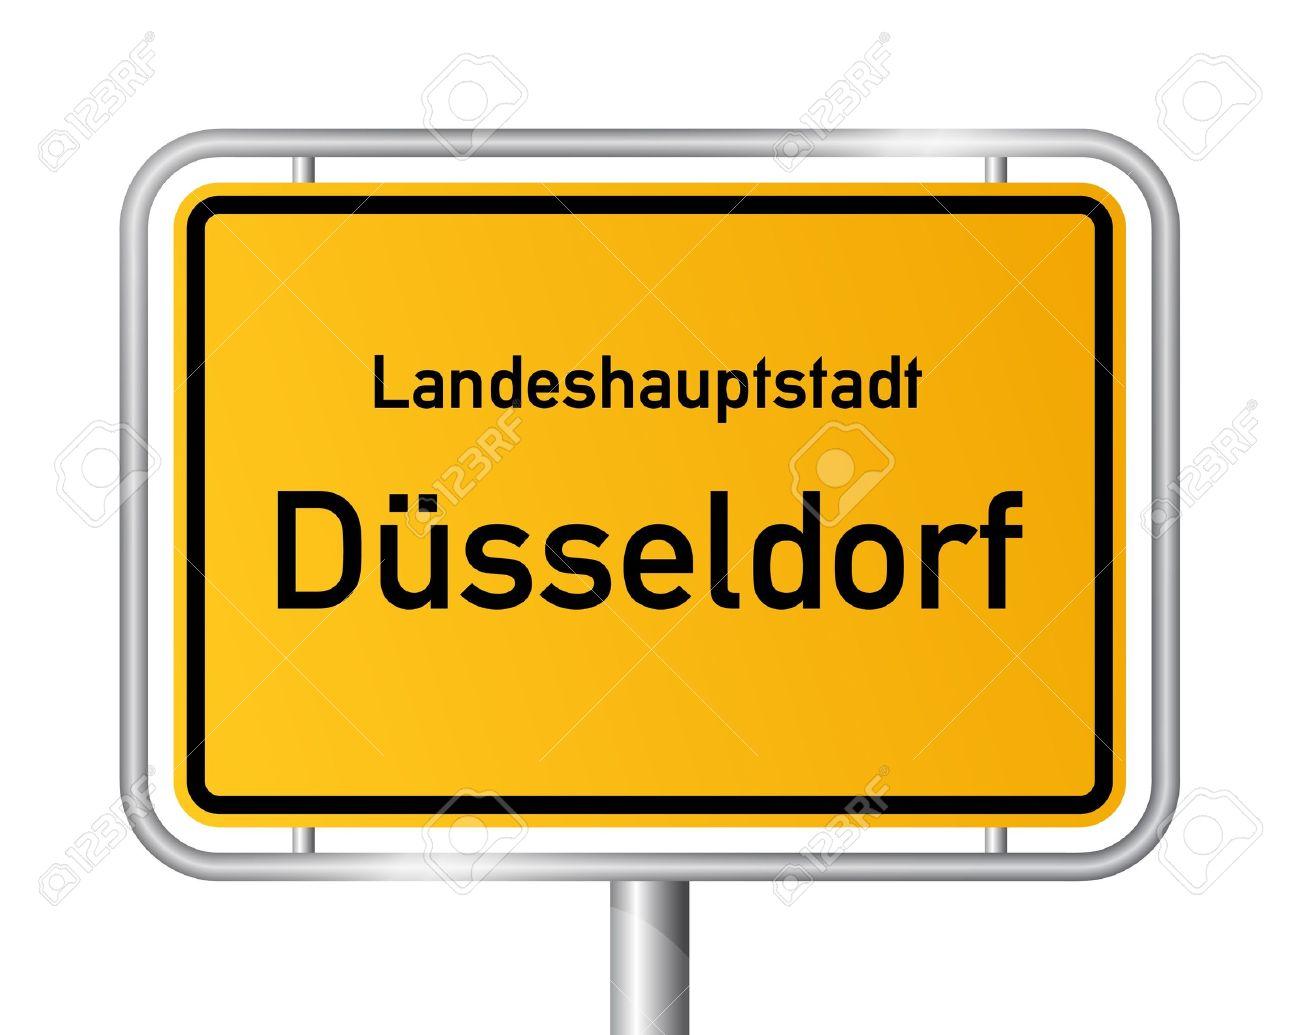 City Limit Sign DUSSELDORF / D SSELDORF Against White Background.